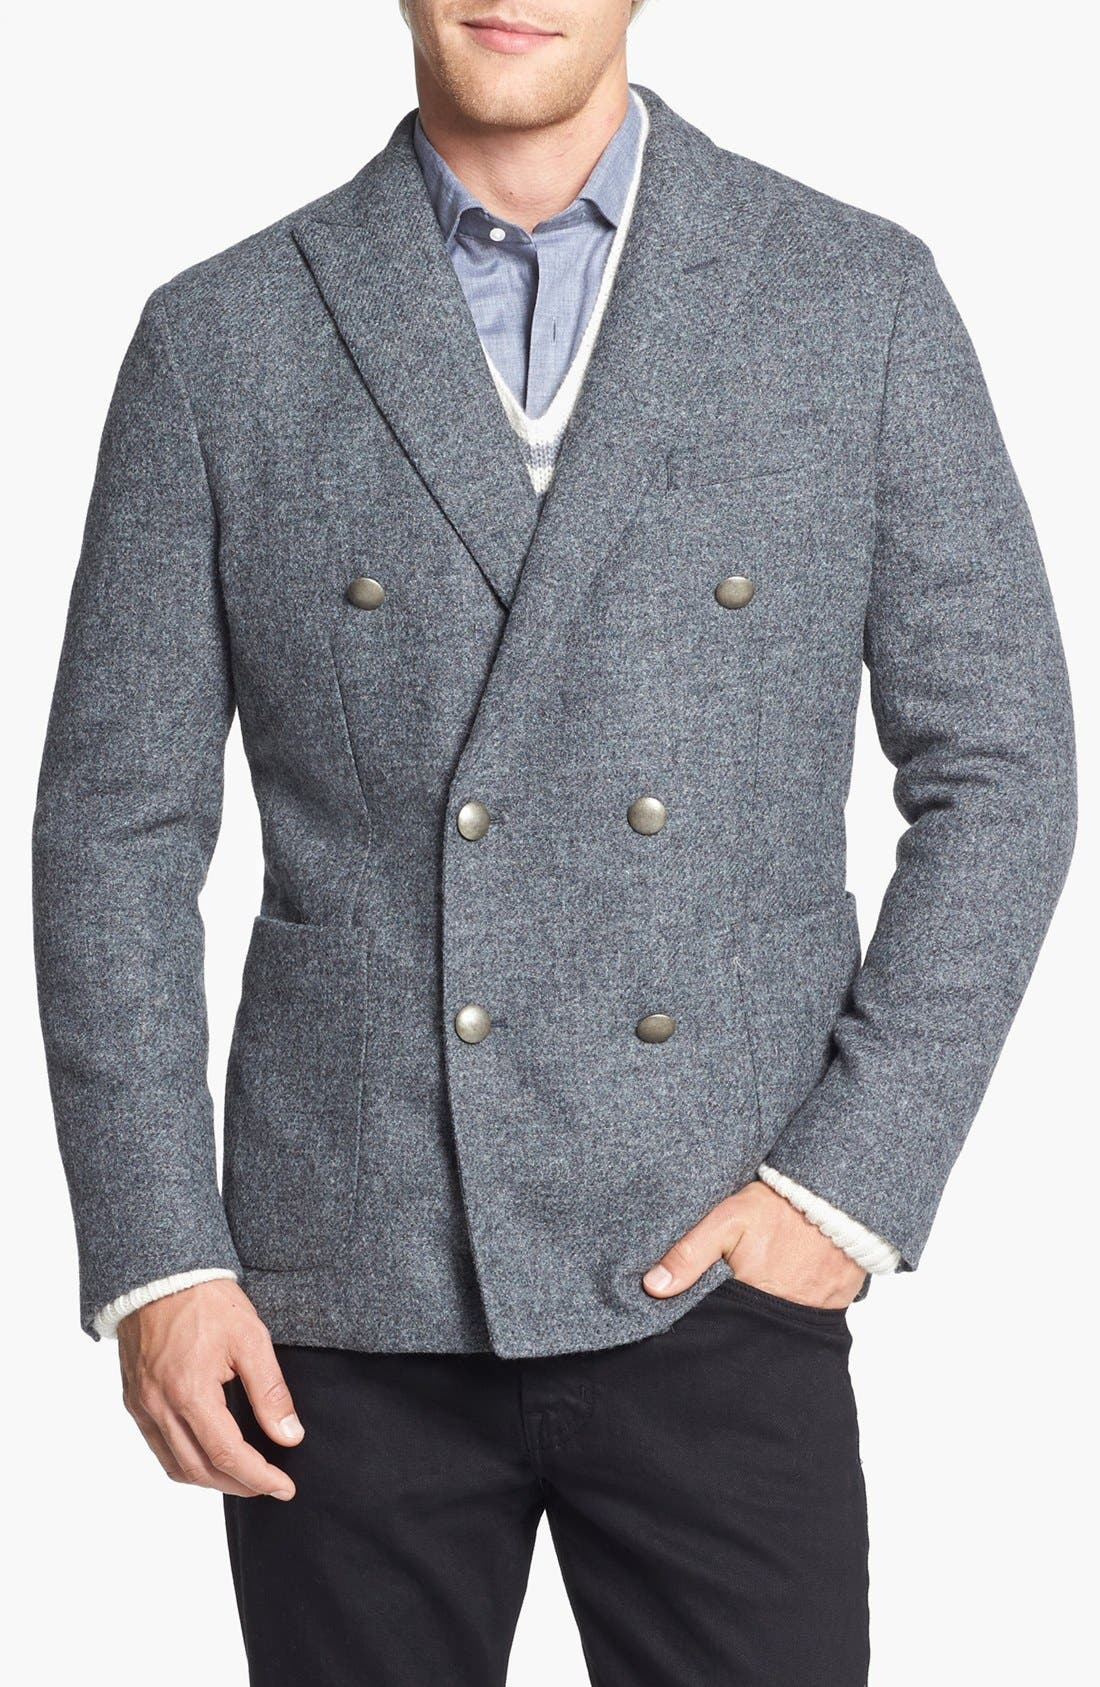 Main Image - Kent and Curwen 'Worthington' Double Breasted Shetland Wool Sportcoat